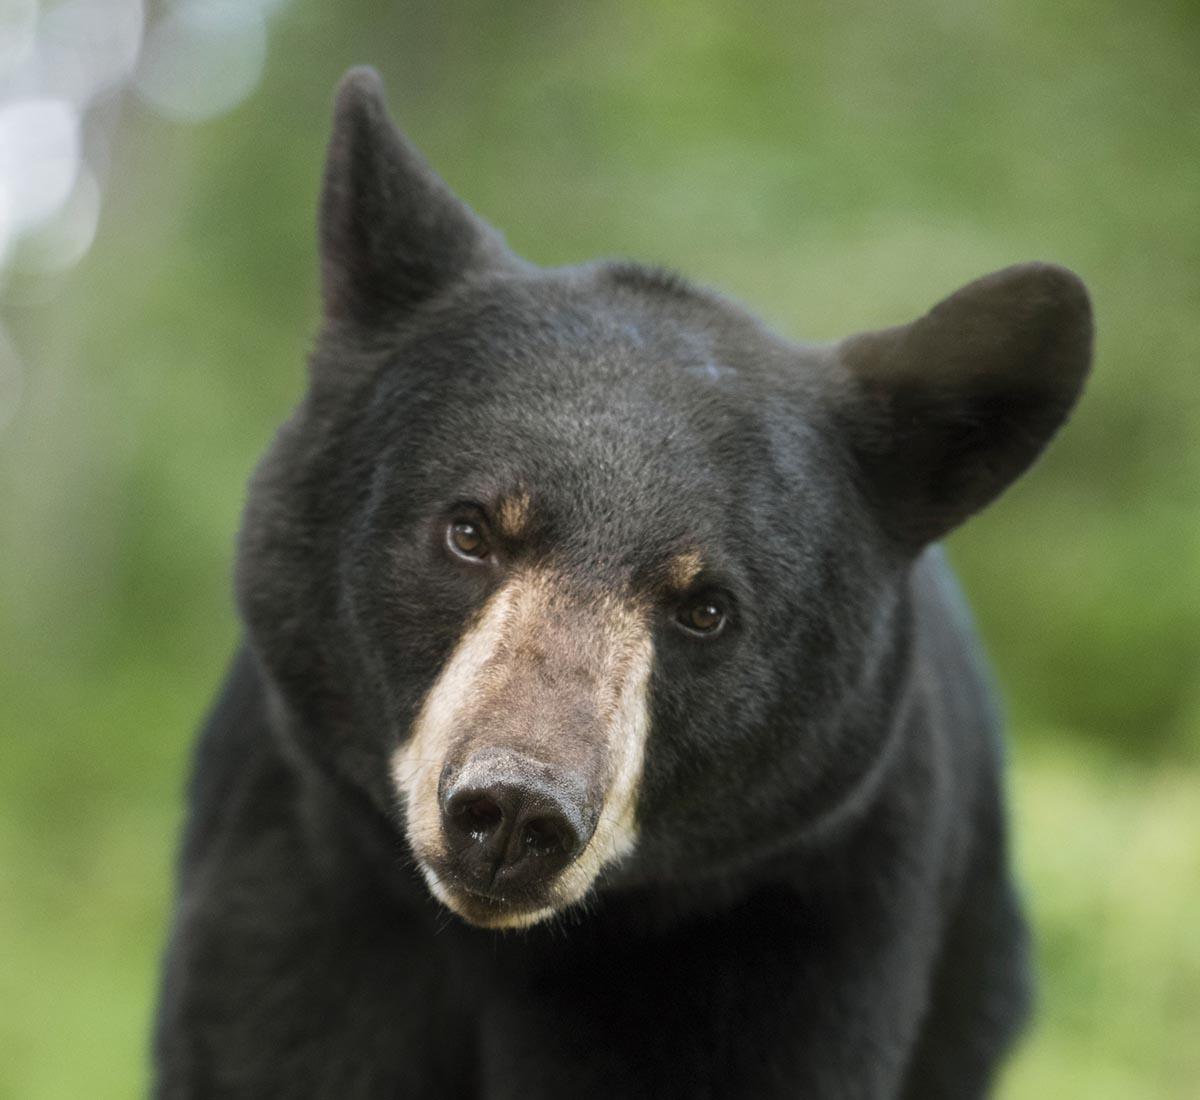 myth black bears stink